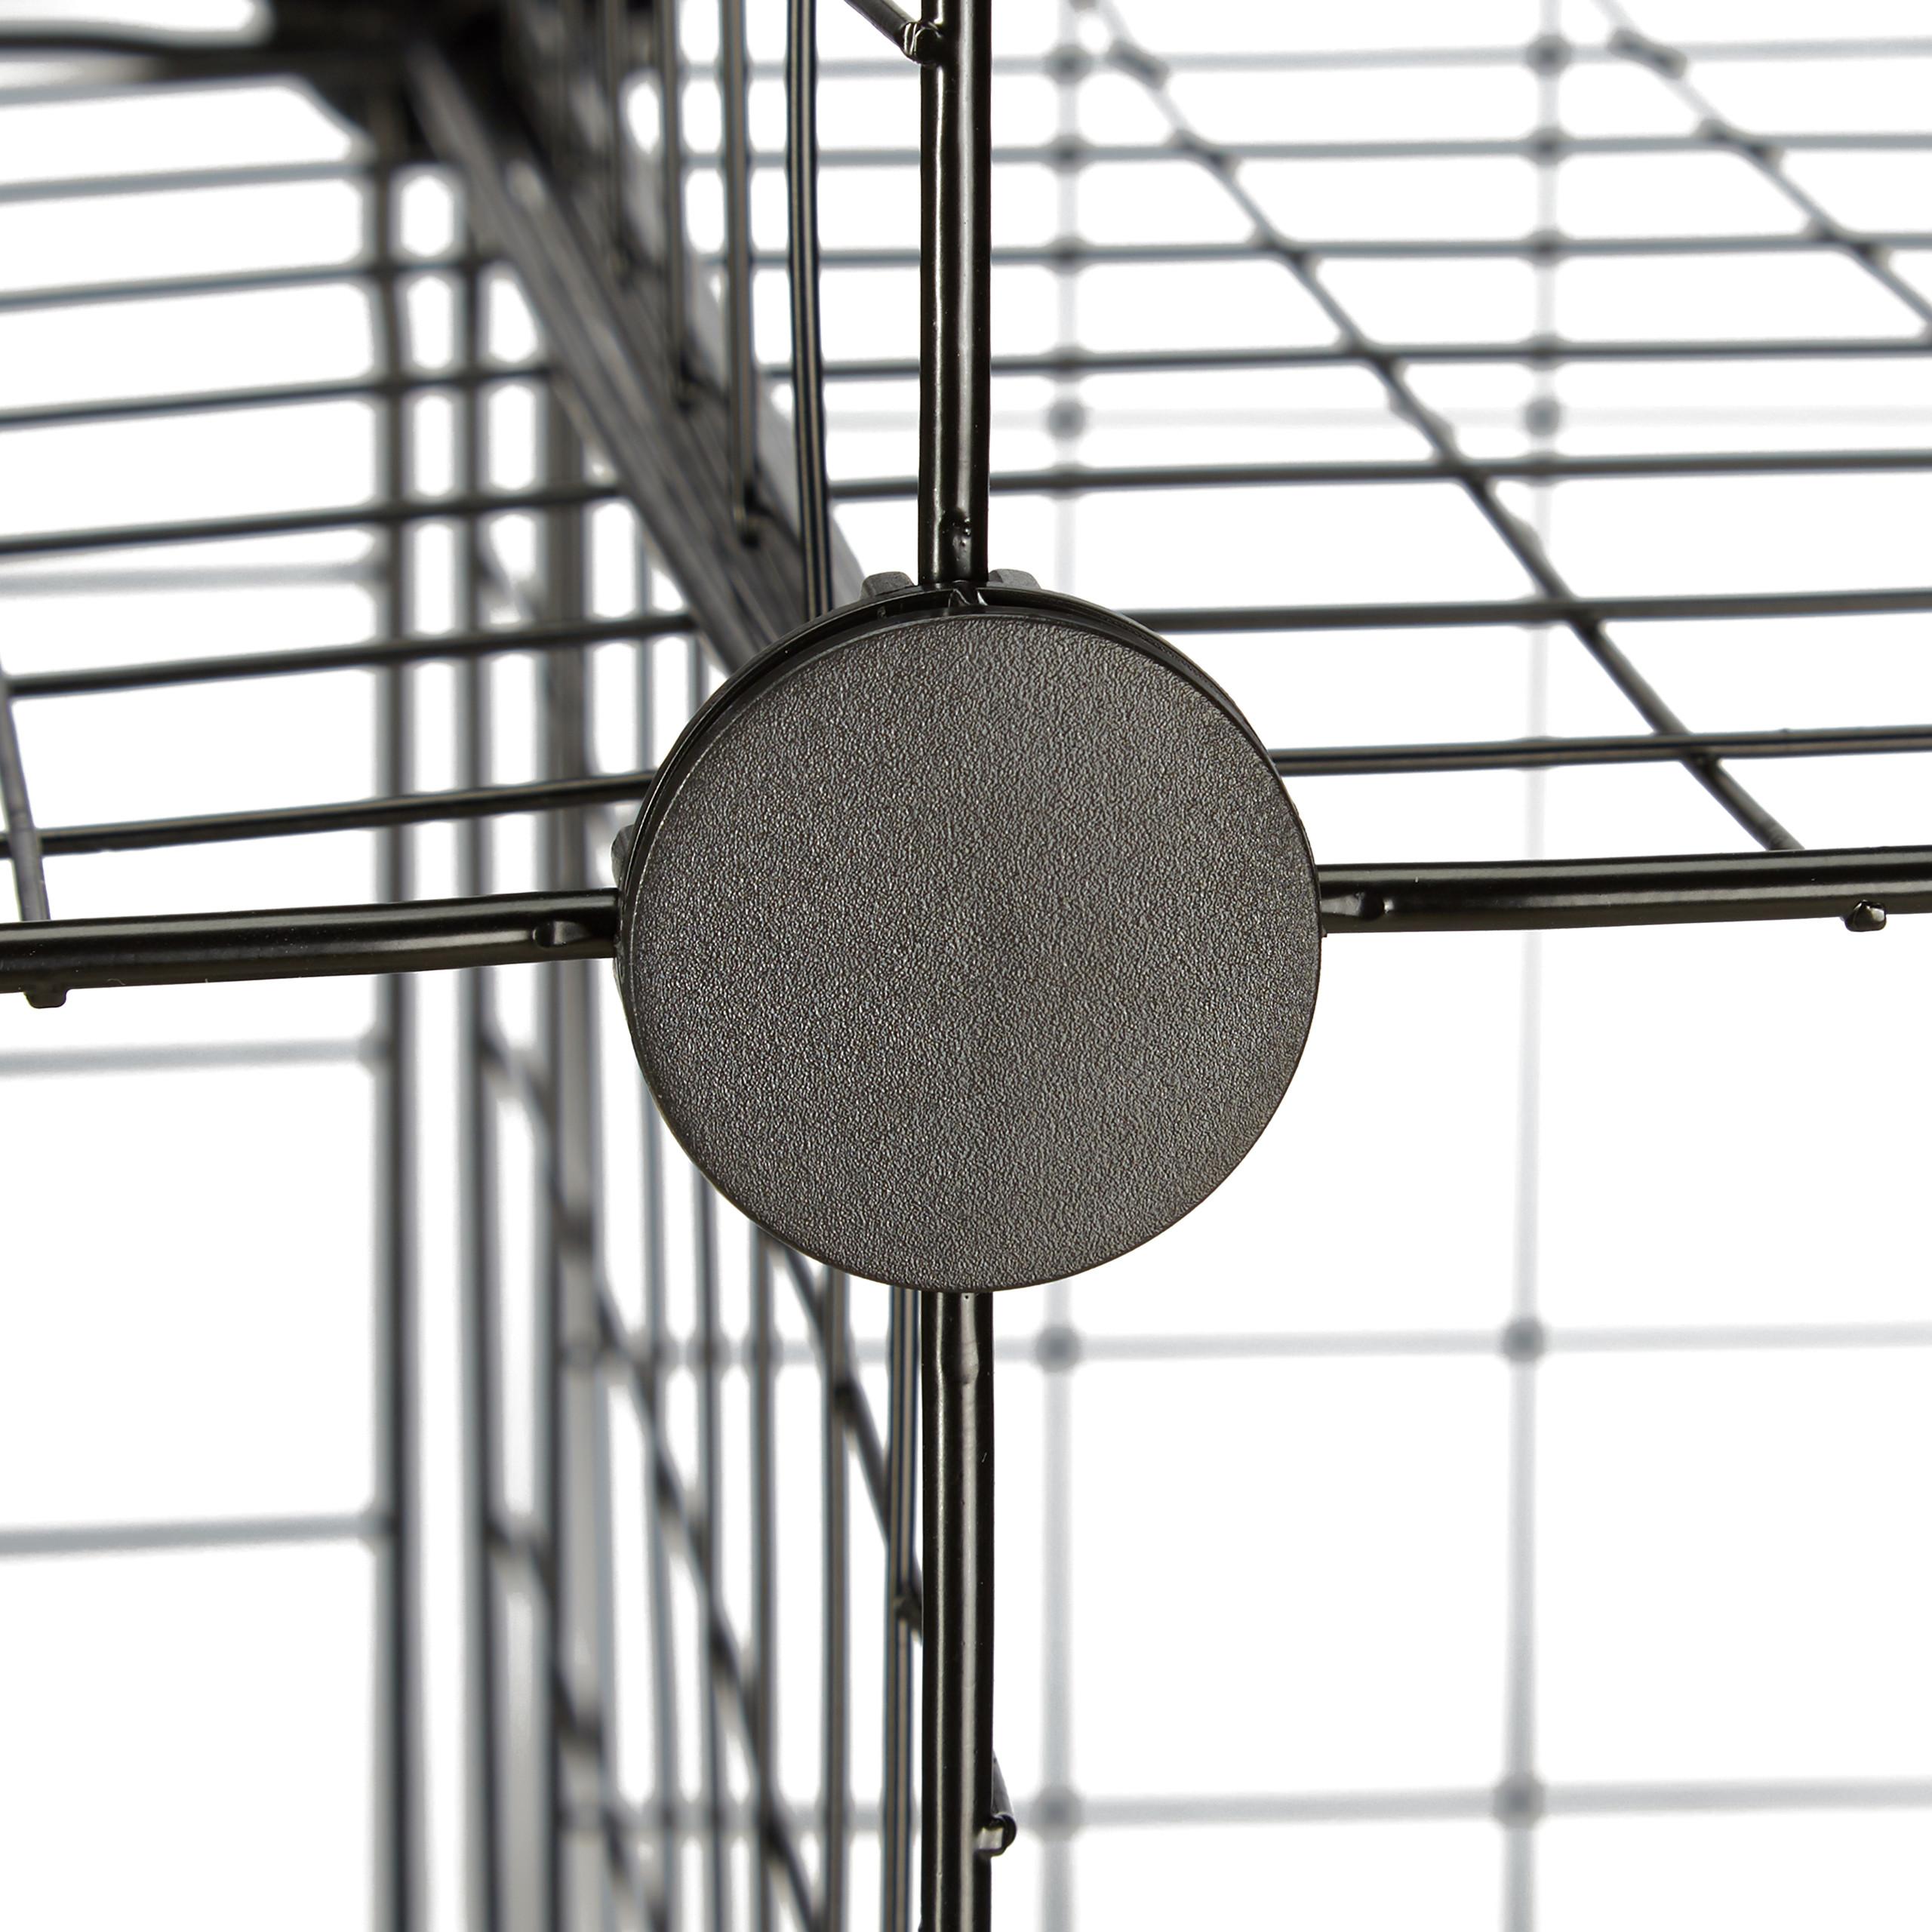 Würfelregal 9 Fächer Steckregal Drahtgitter DIY Modulregal Aufbewahrungssystem